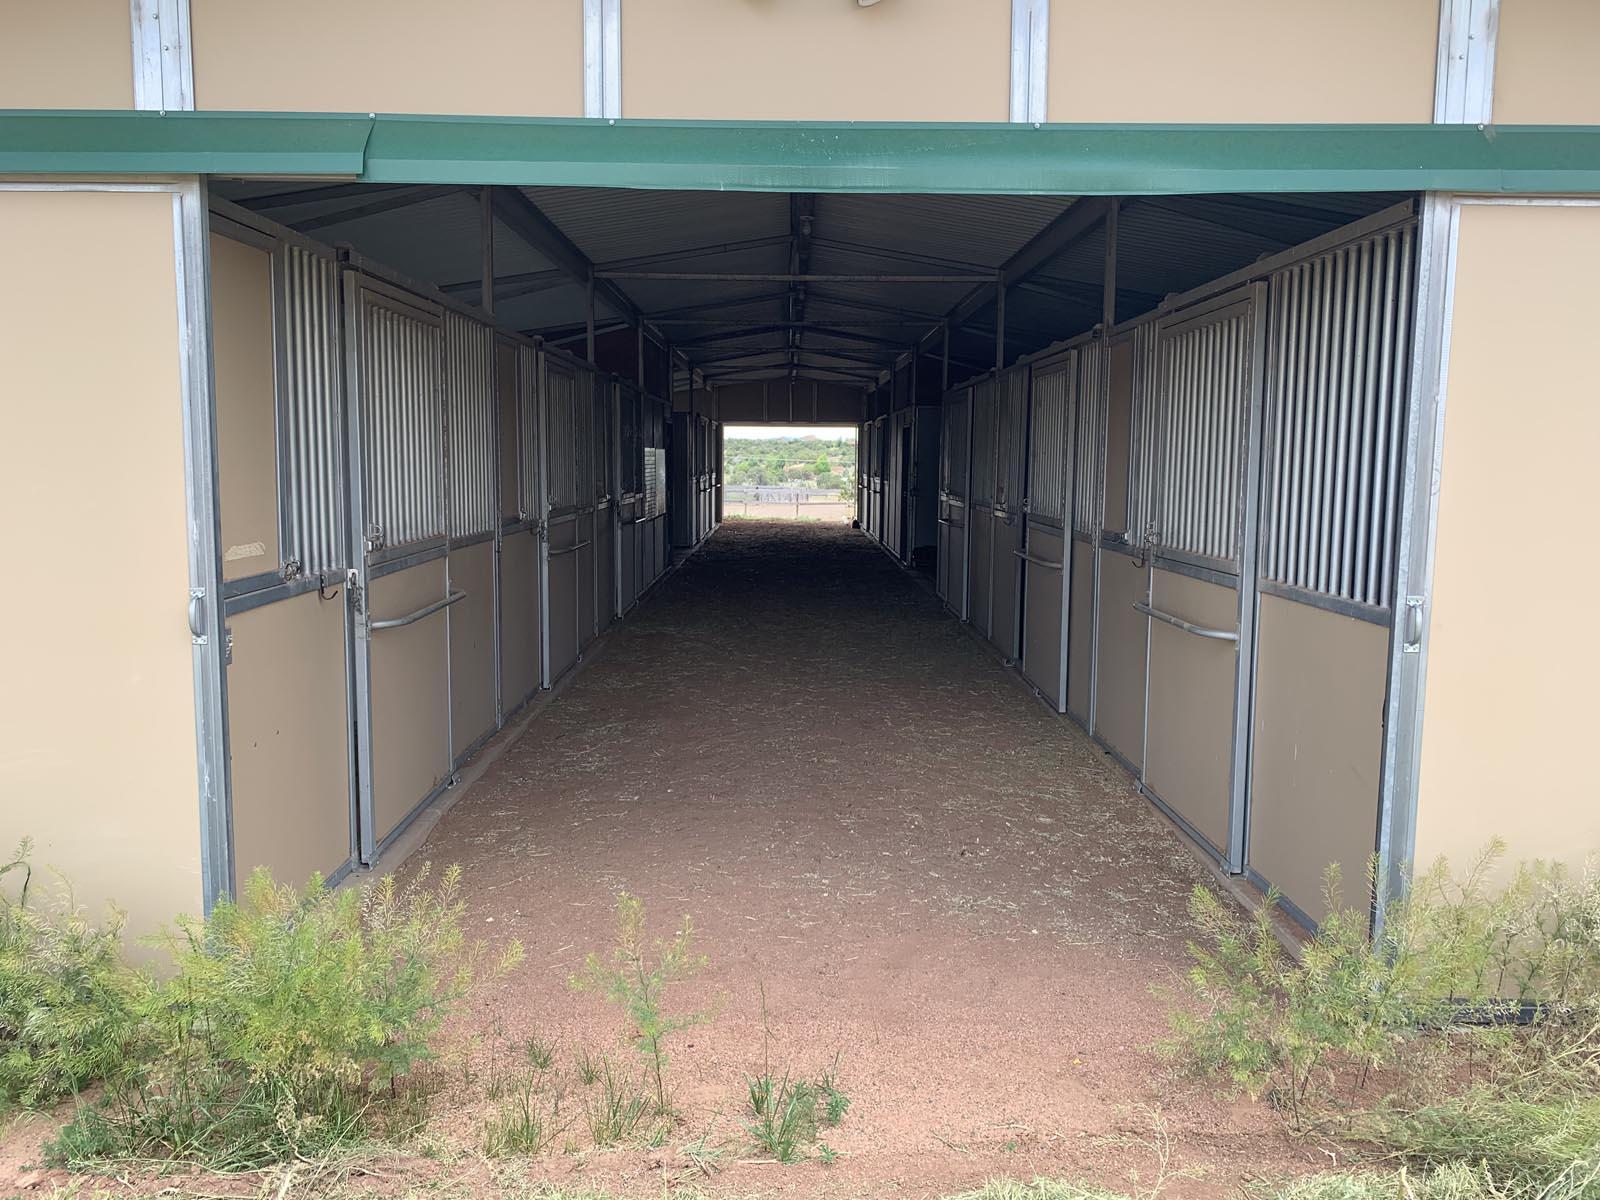 Barn aisle at Tiger Owl Ranch horse boarding facility in Santa Fe, New Mexico